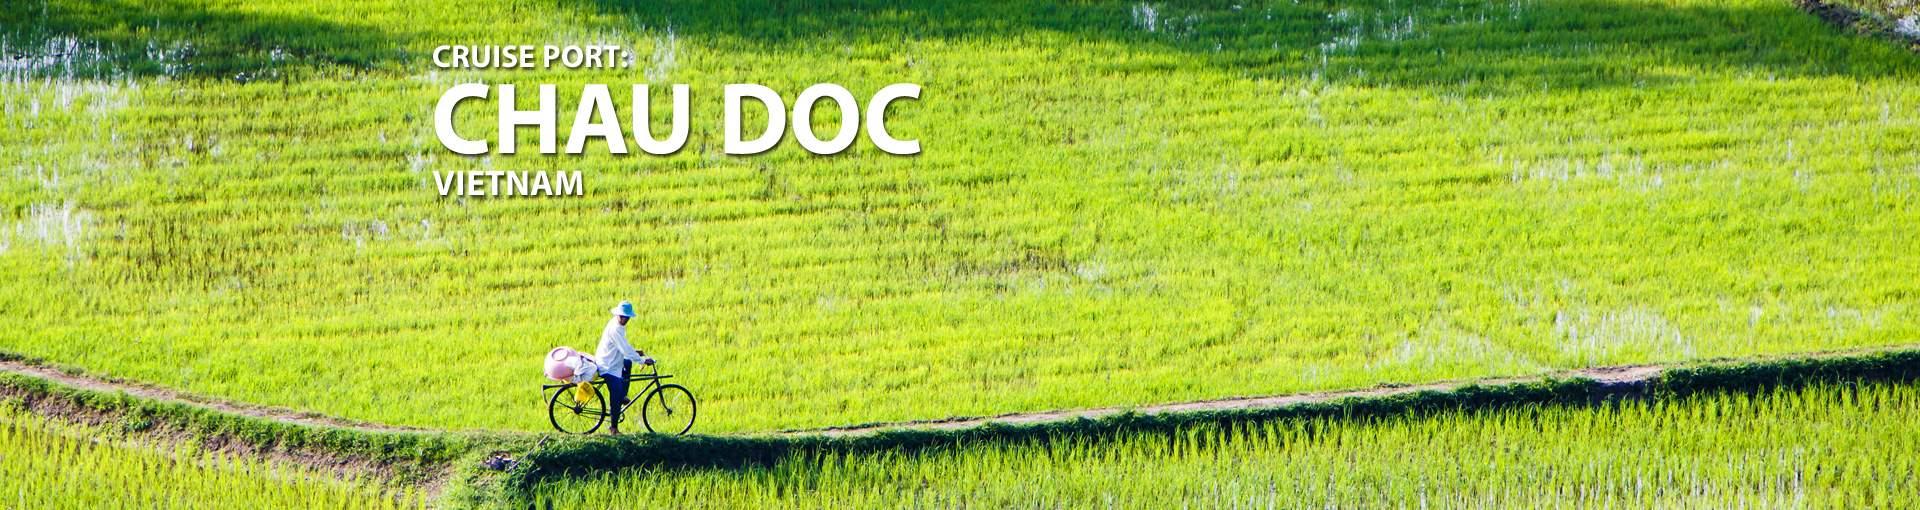 Cruises to Chau Doc, Vietnam